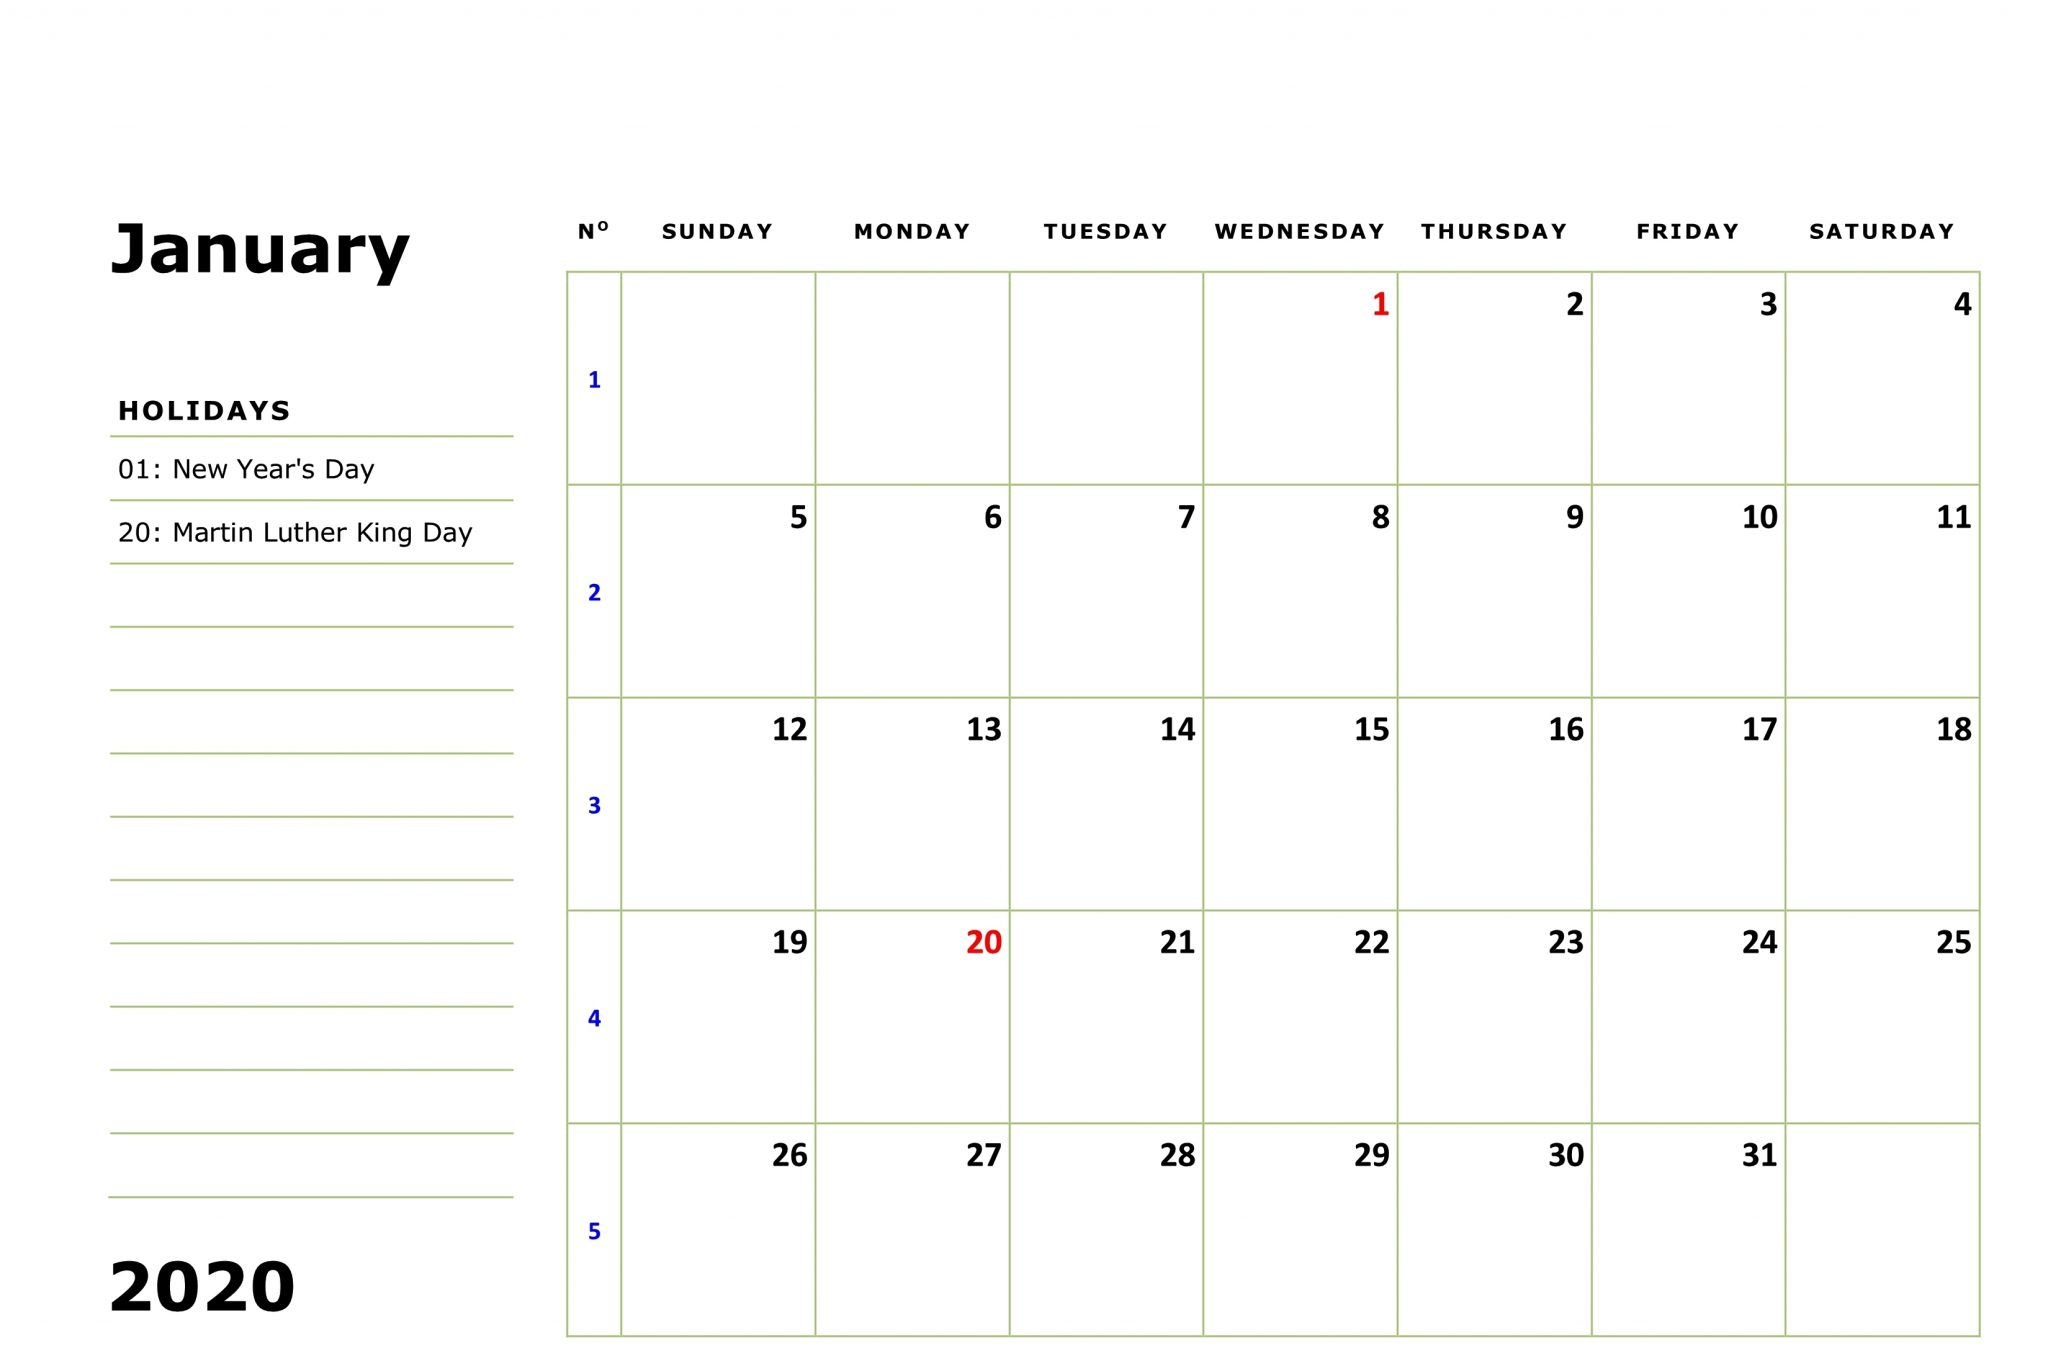 January 2020 Calendar Holidays Template